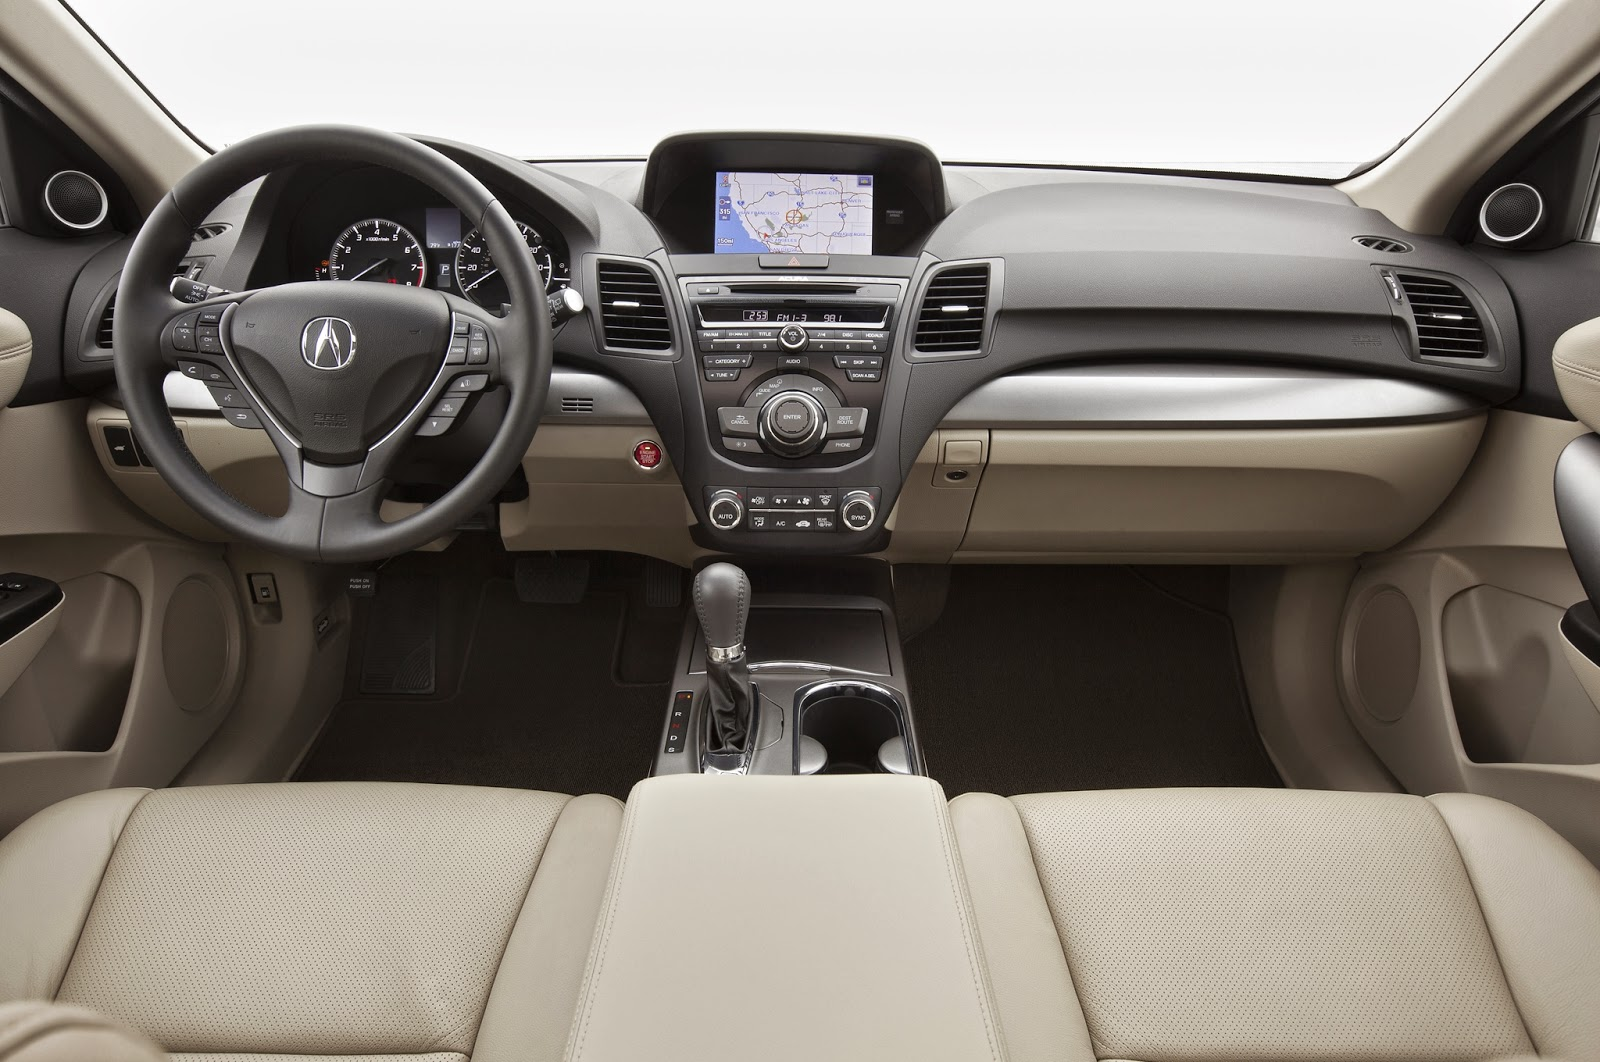 2015 Acura RSX Interior